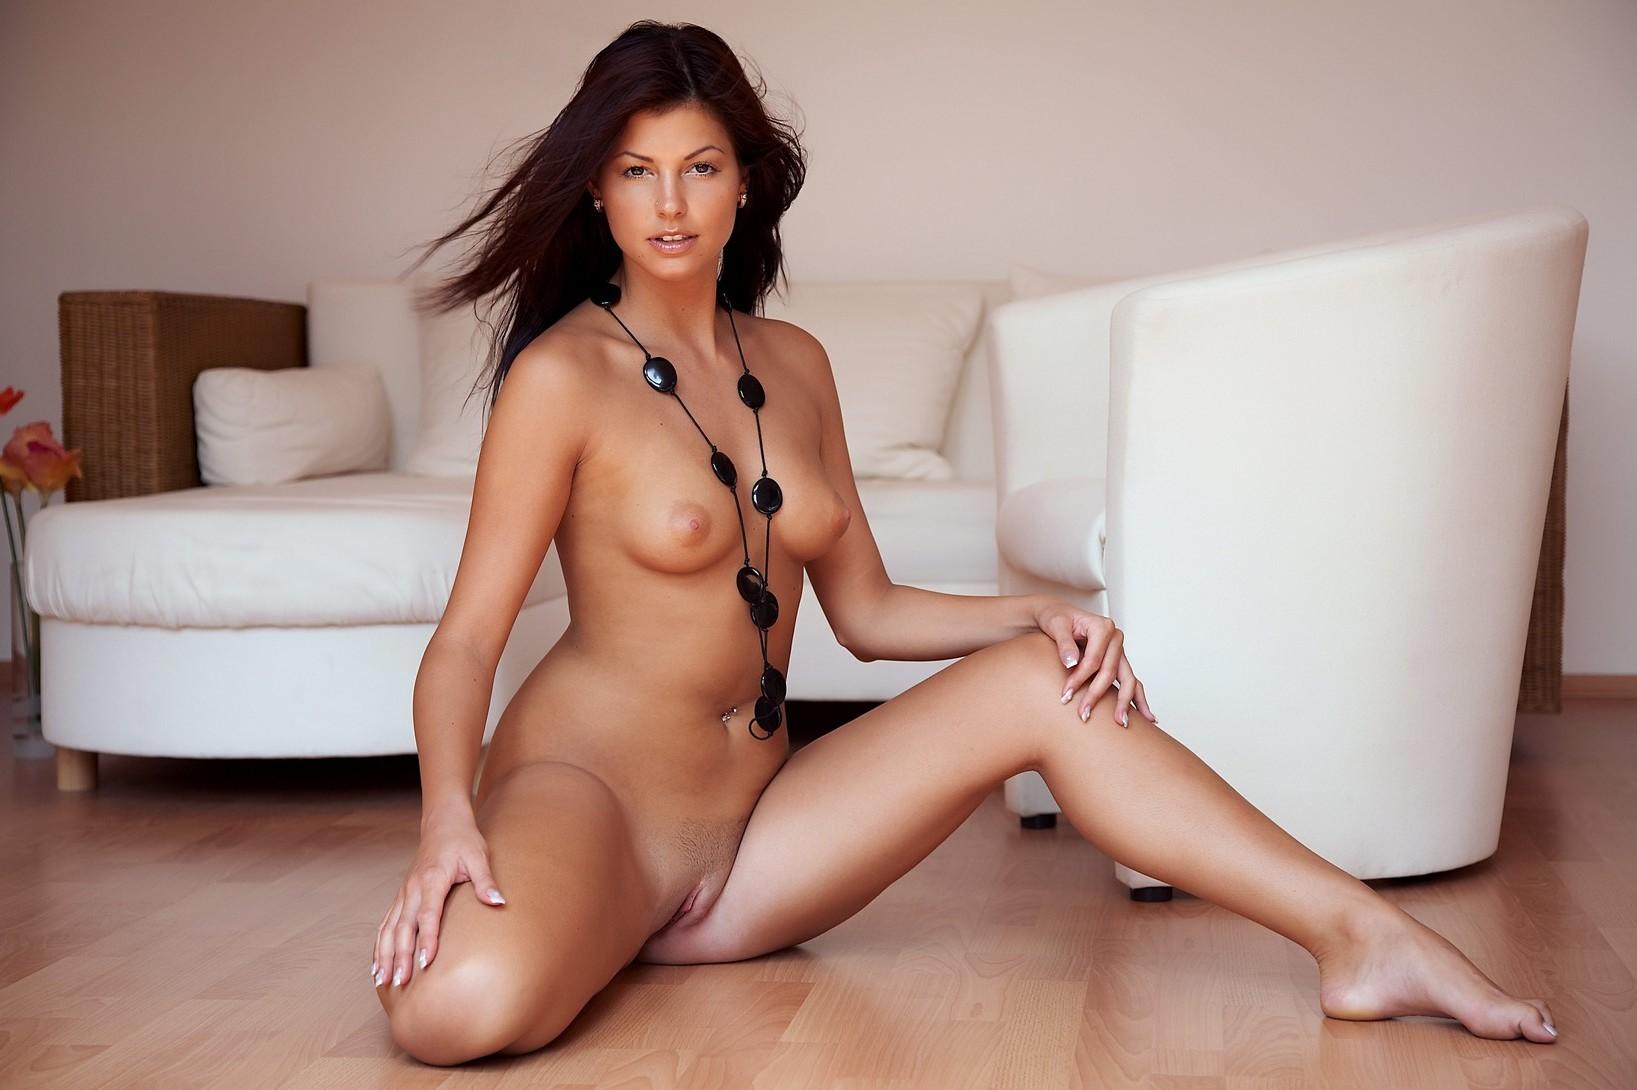 flash chat escort agency